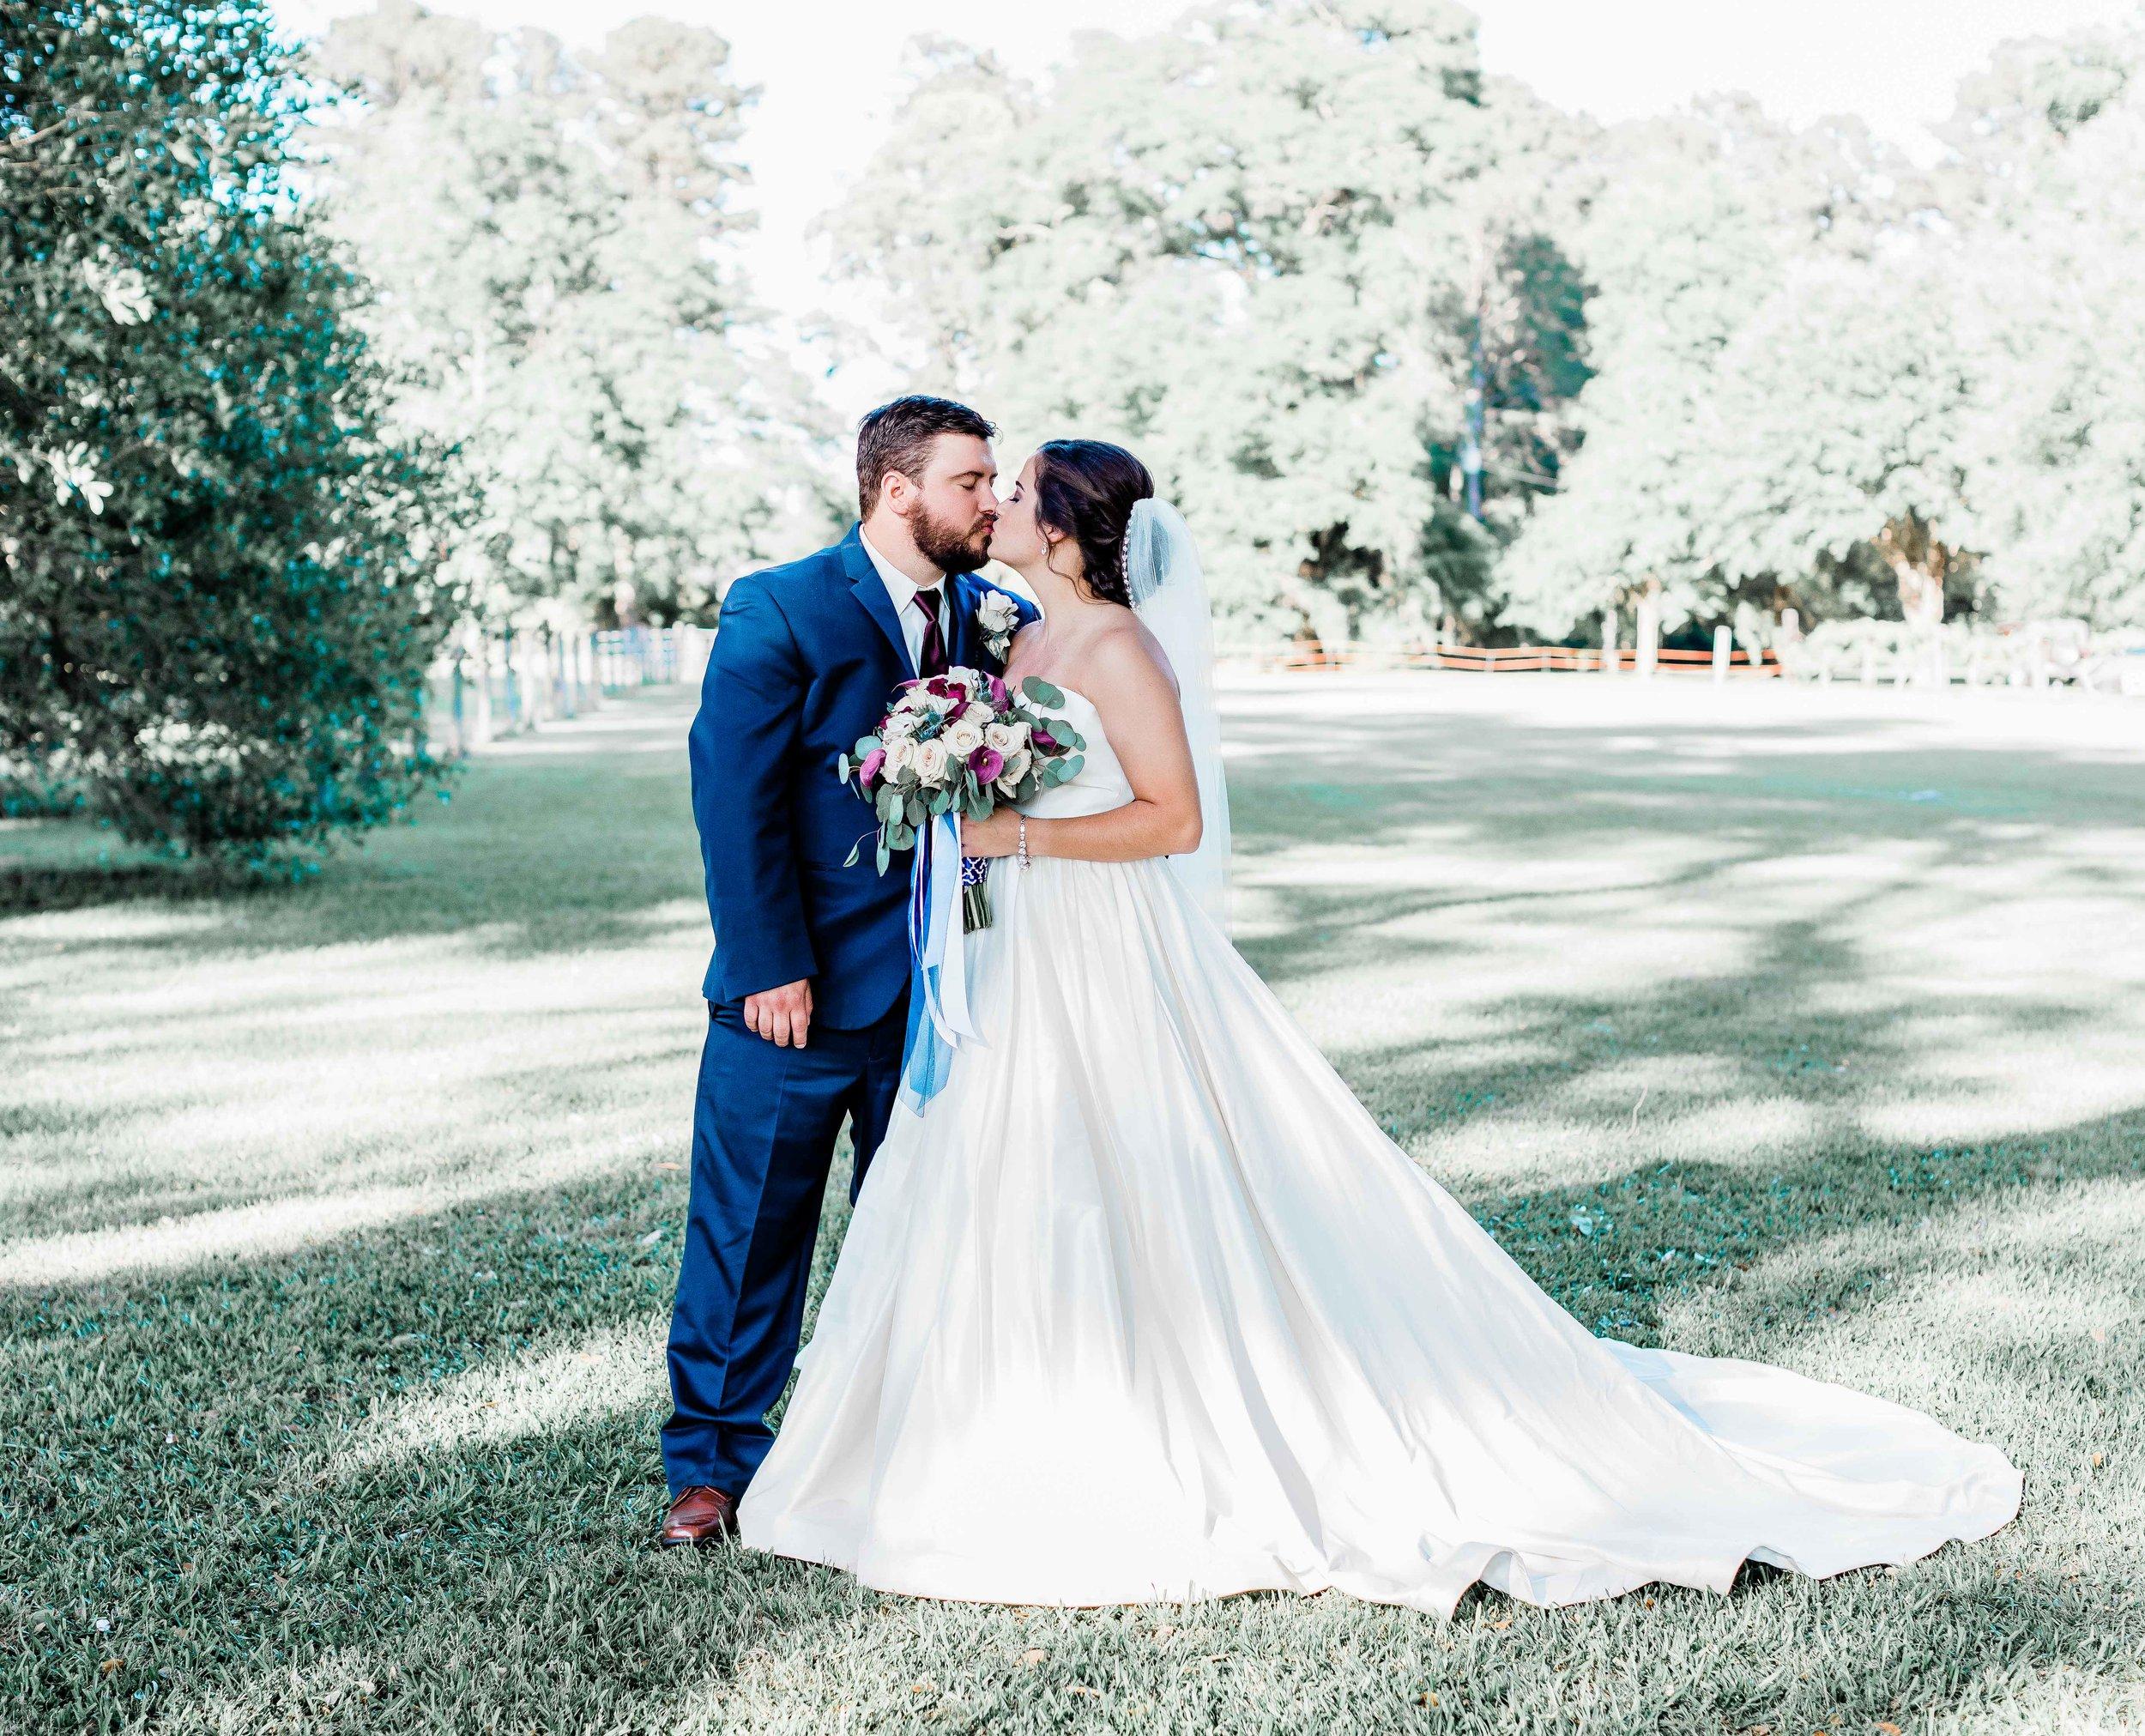 20190427-Southern Lens Photography- Savannah Wedding Photographer-Screven and Caroline-201981.jpg